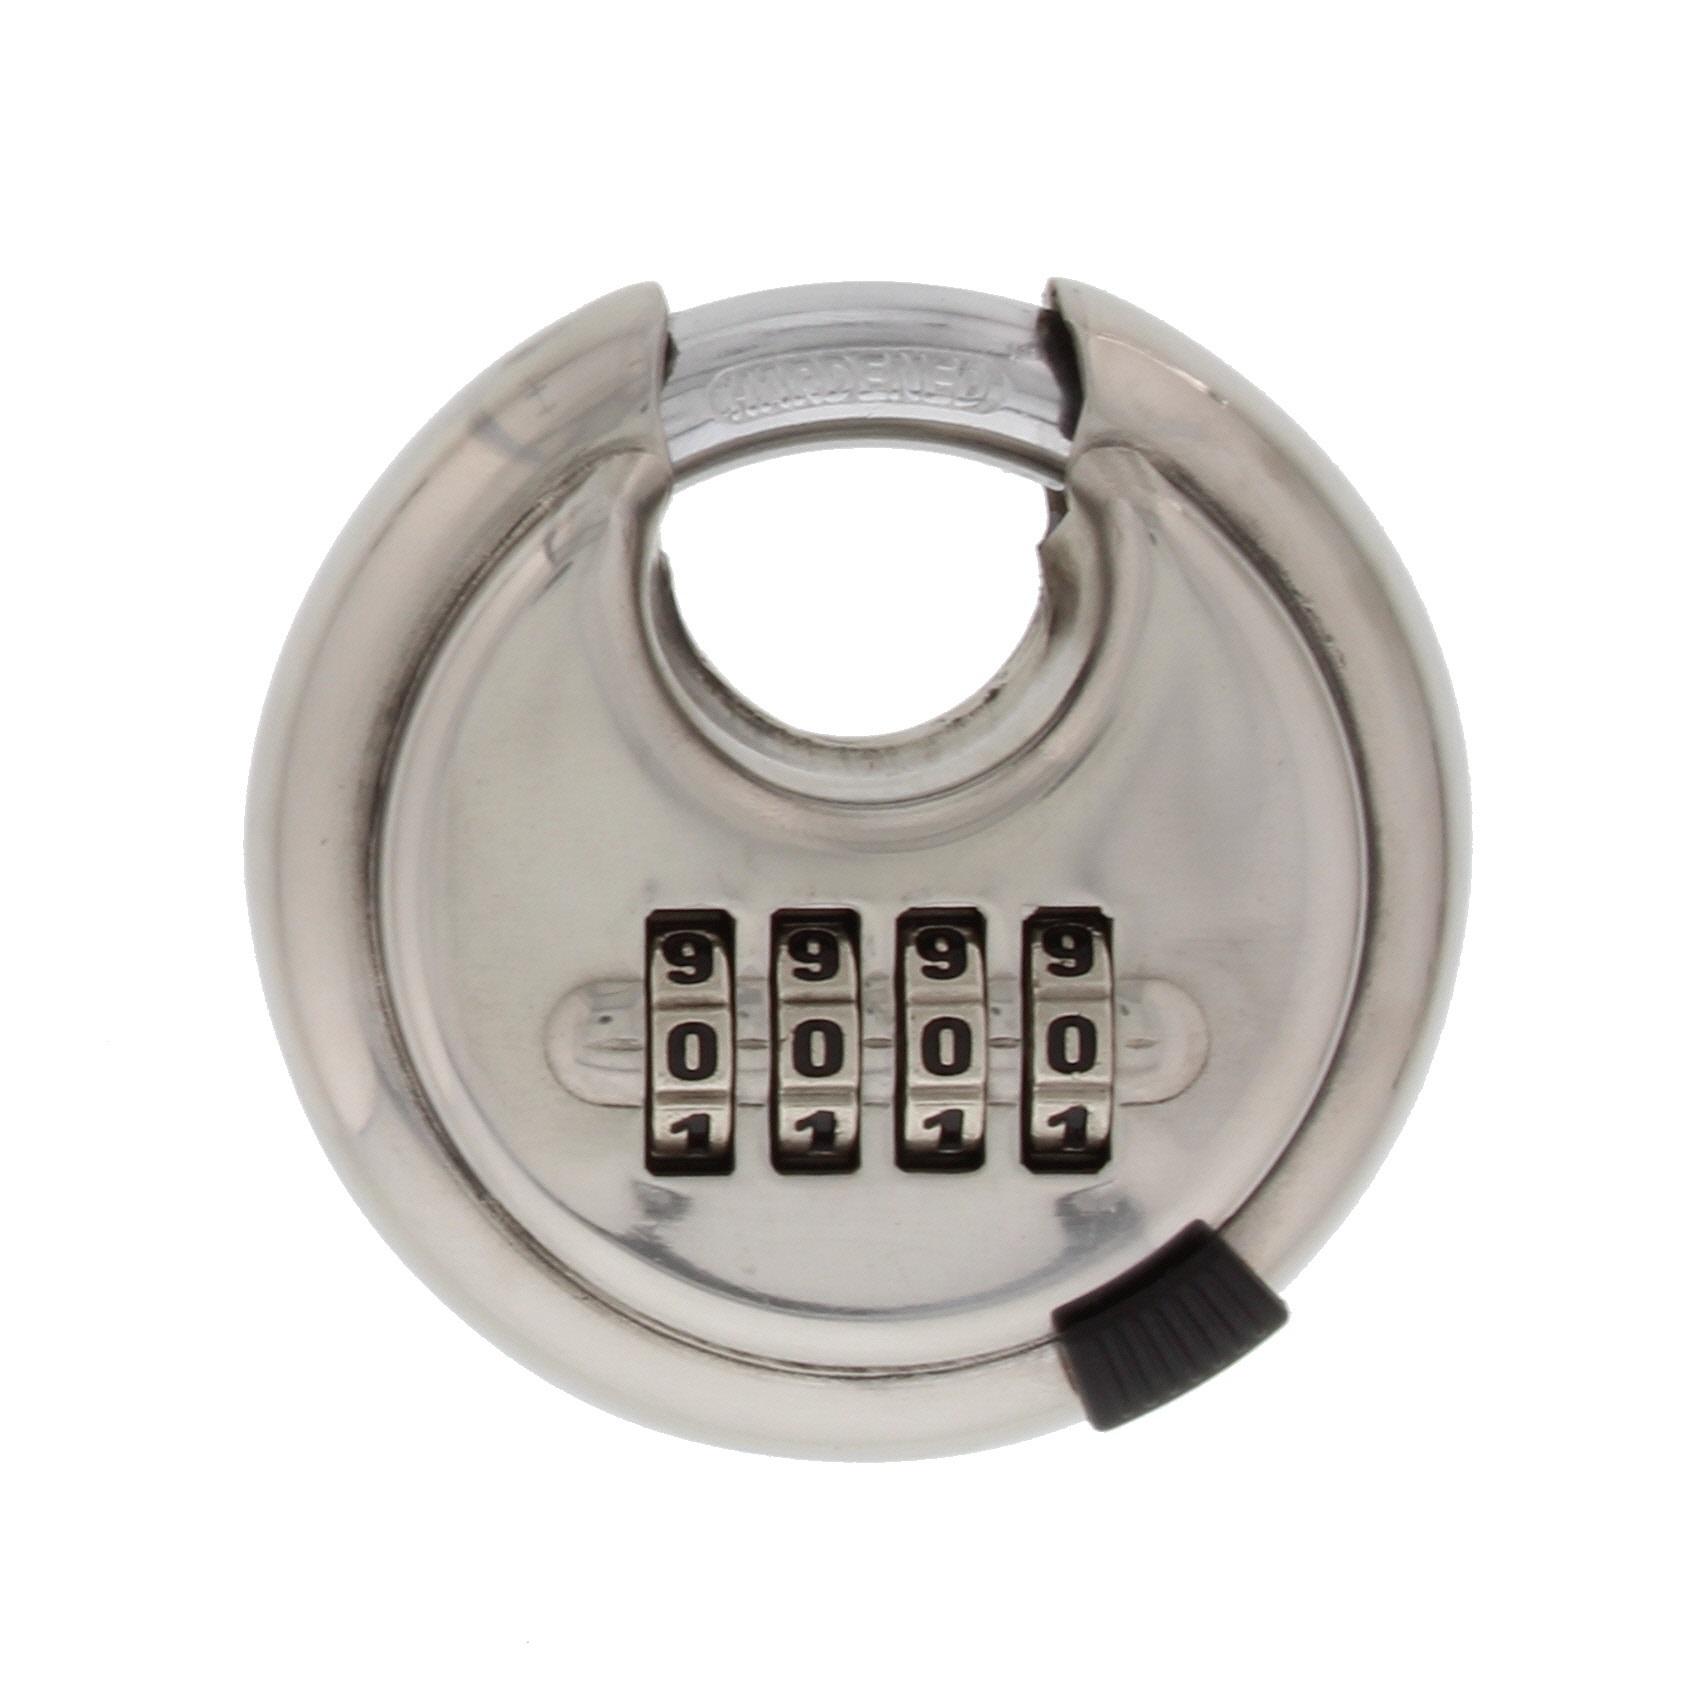 Commercial combination locks